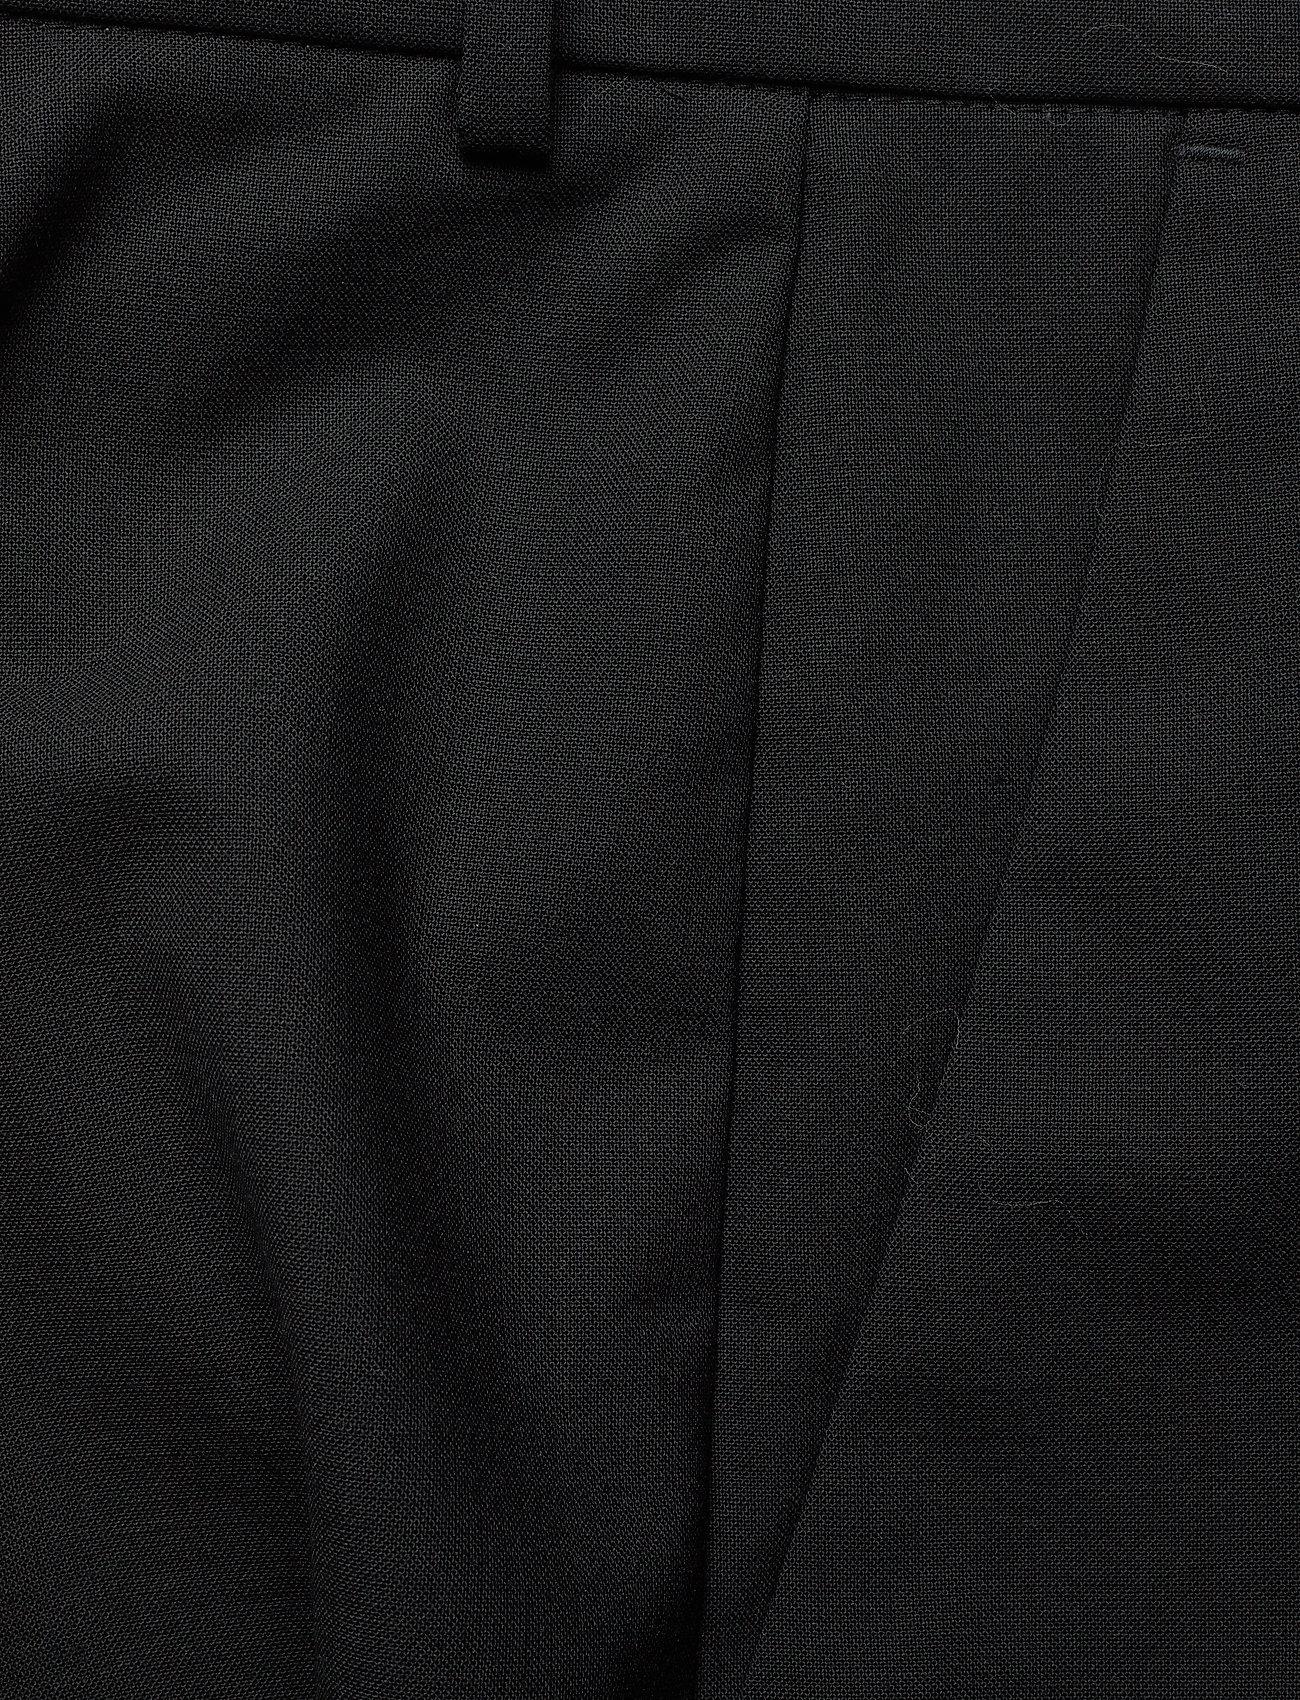 Trousersblack Trousersblack Star Star SuitHope Trousersblack Trousersblack SuitHope Star SuitHope Star xoWCBeQdr